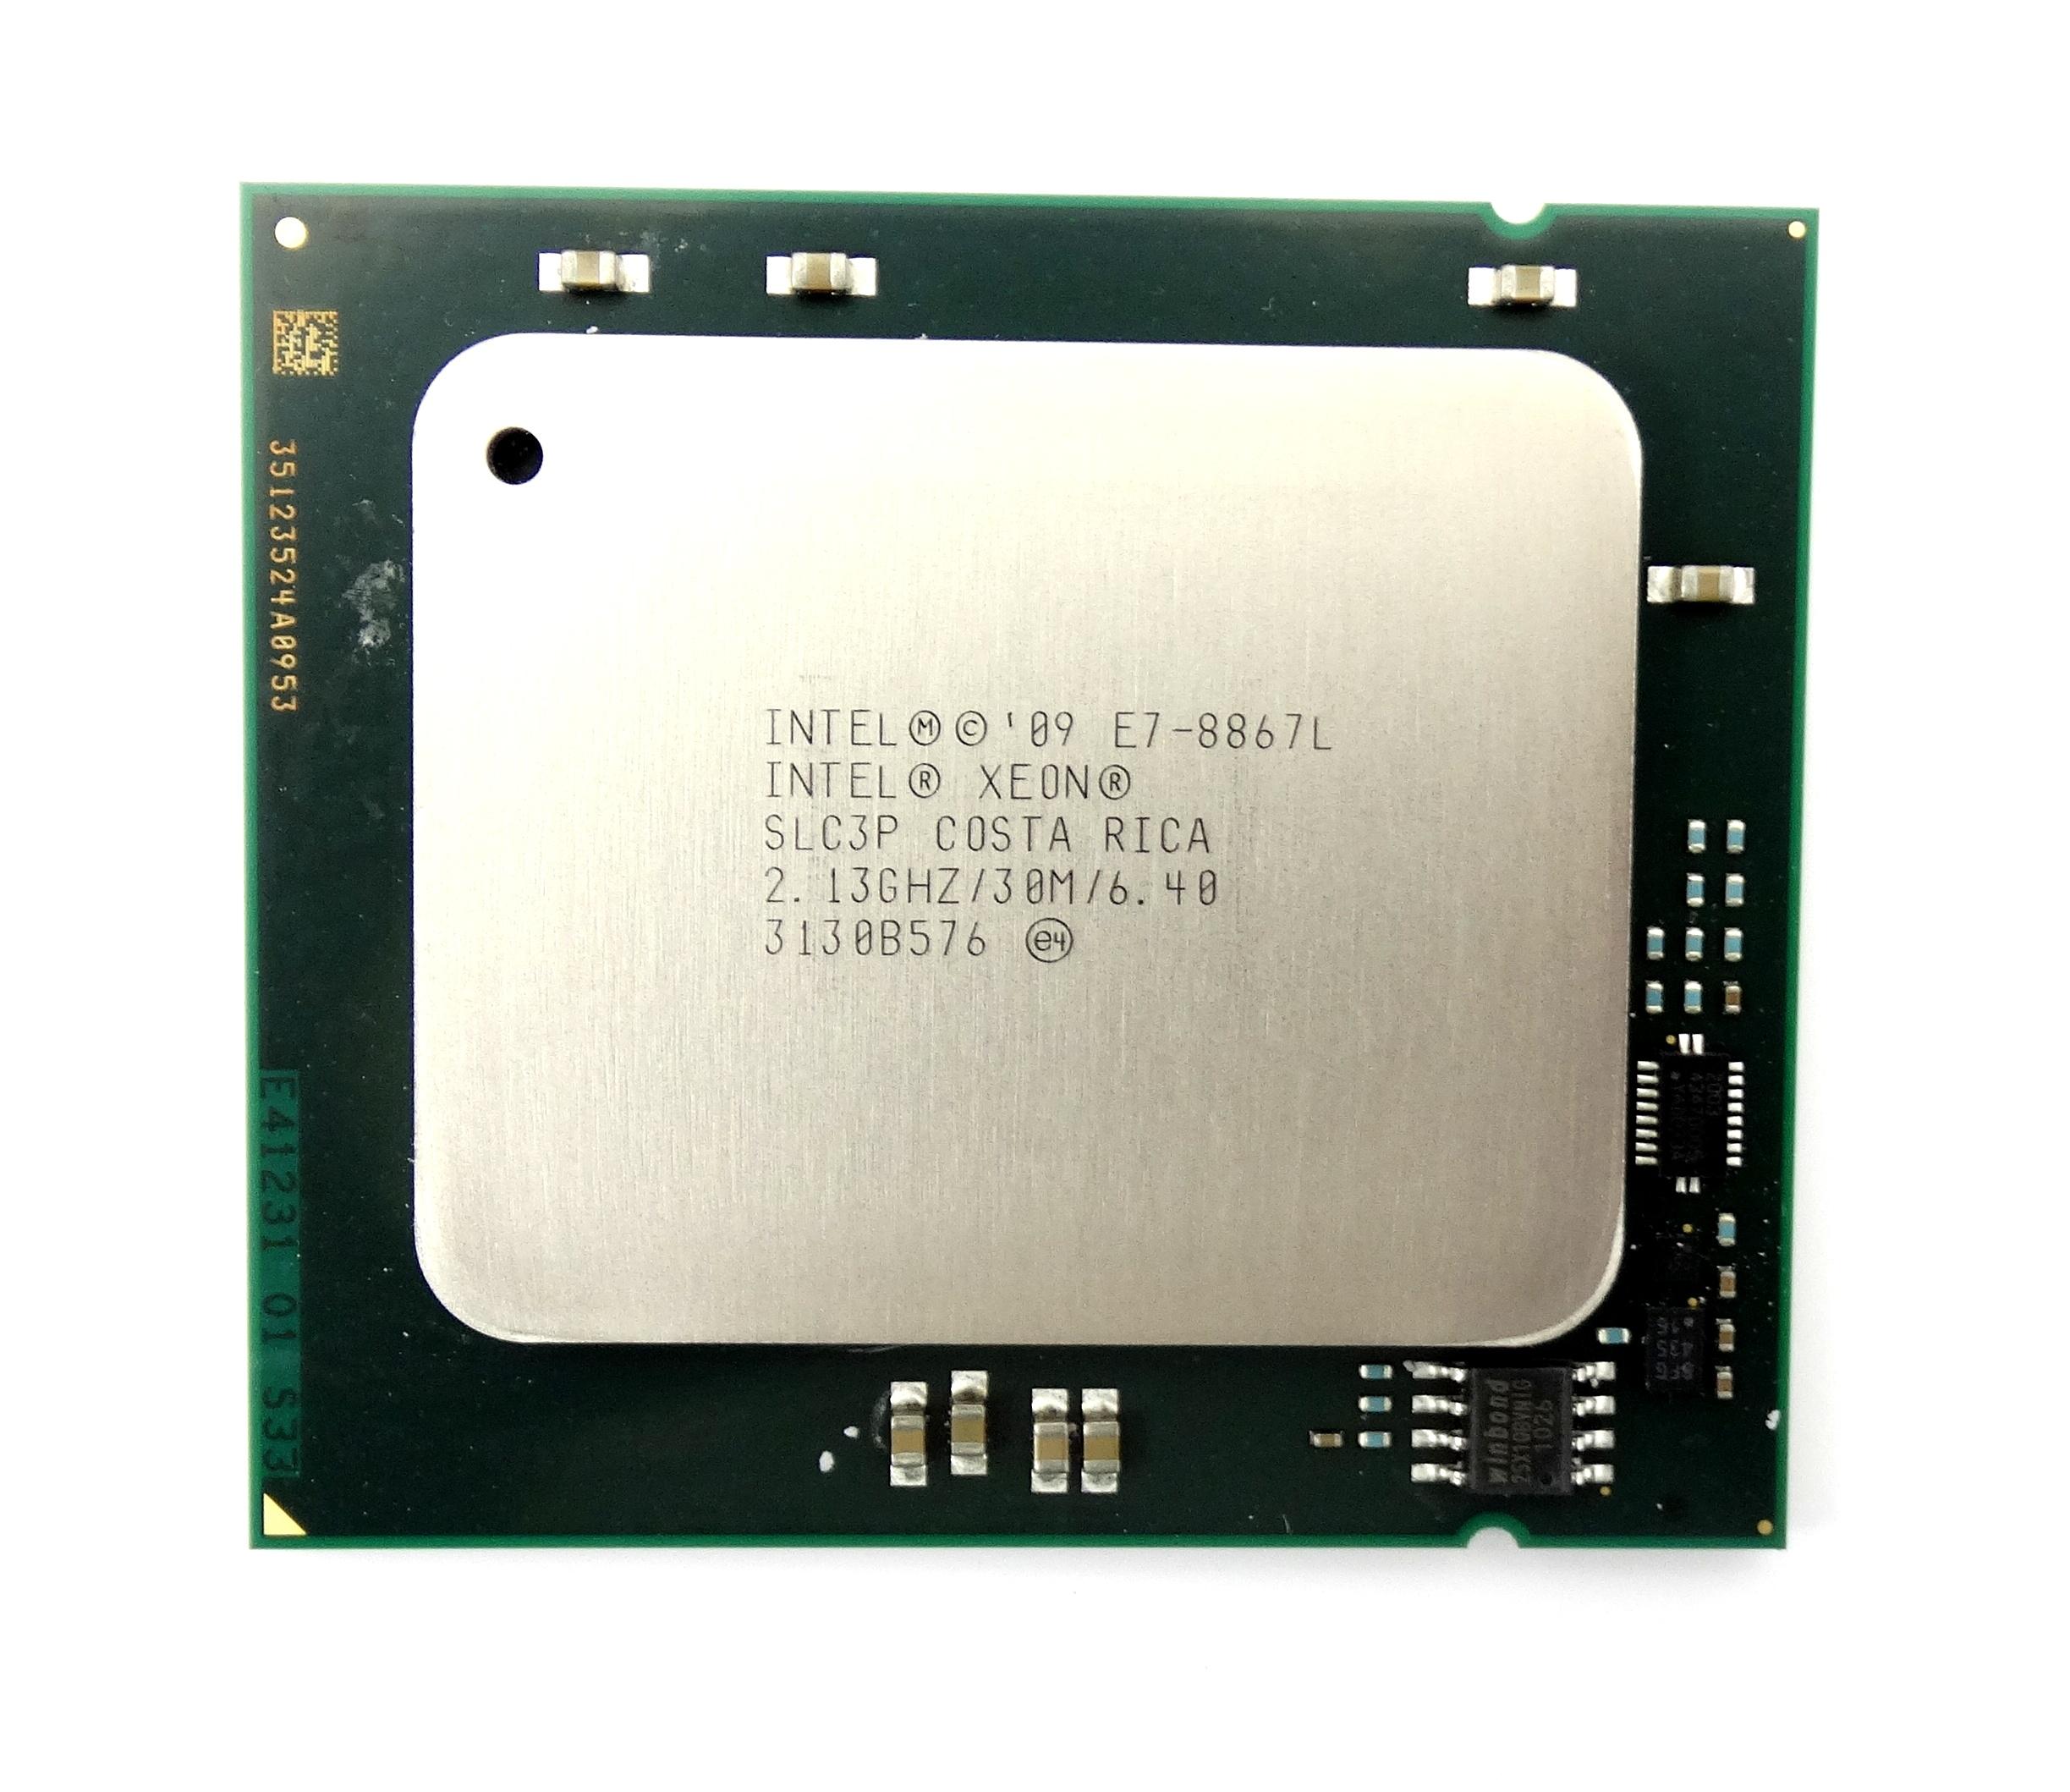 INTEL XEON E7-8867L 2.13GHZ 10 CORE 30MB LGA1567 PROCESSOR (SLC3P)